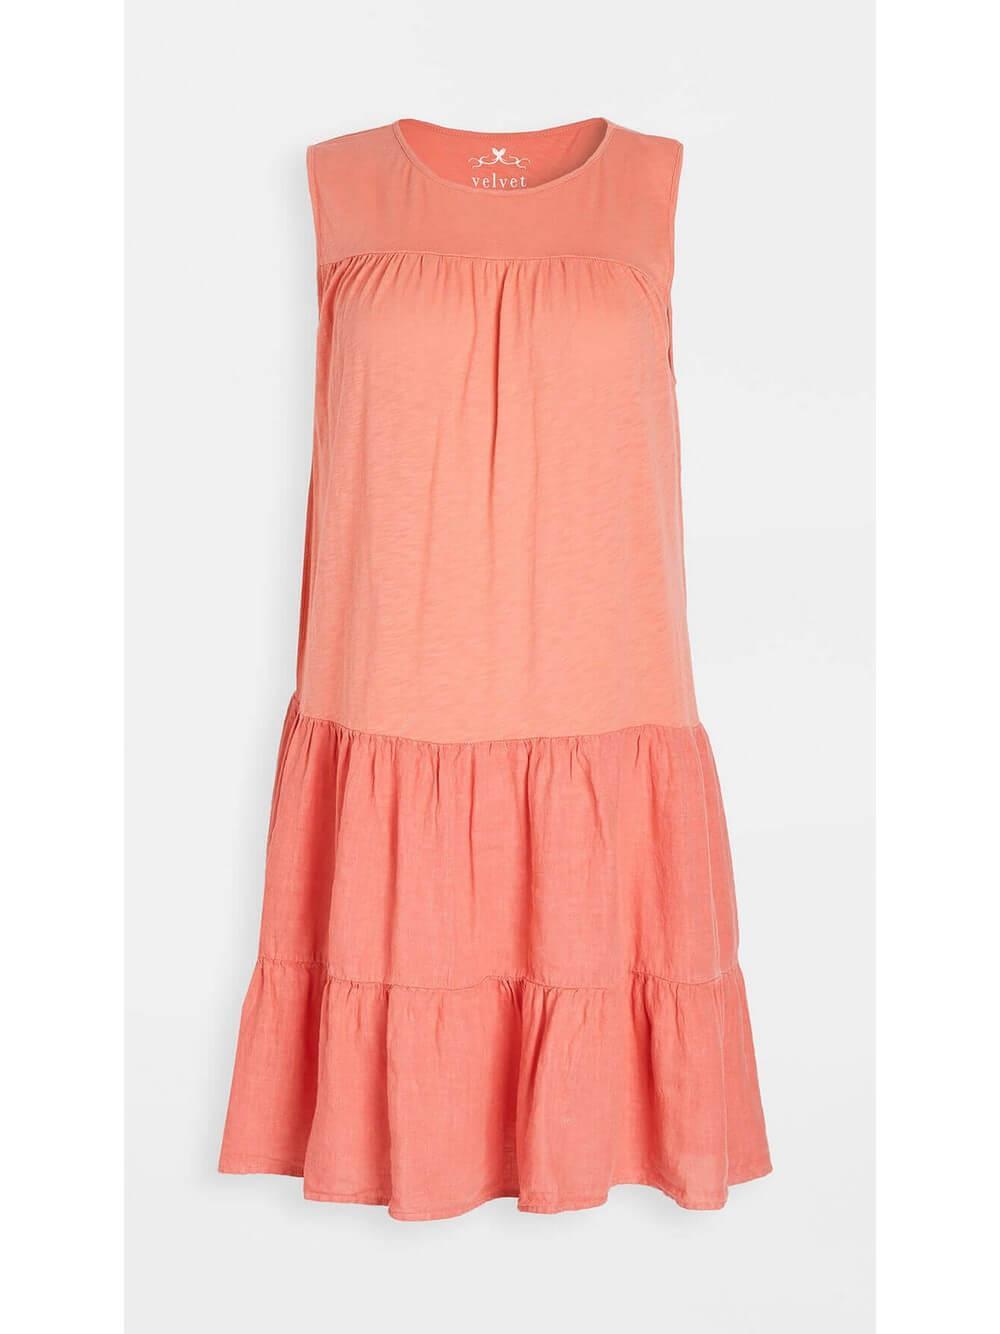 Charlotte Sleeveless Dress Item # CHARLOTTE04